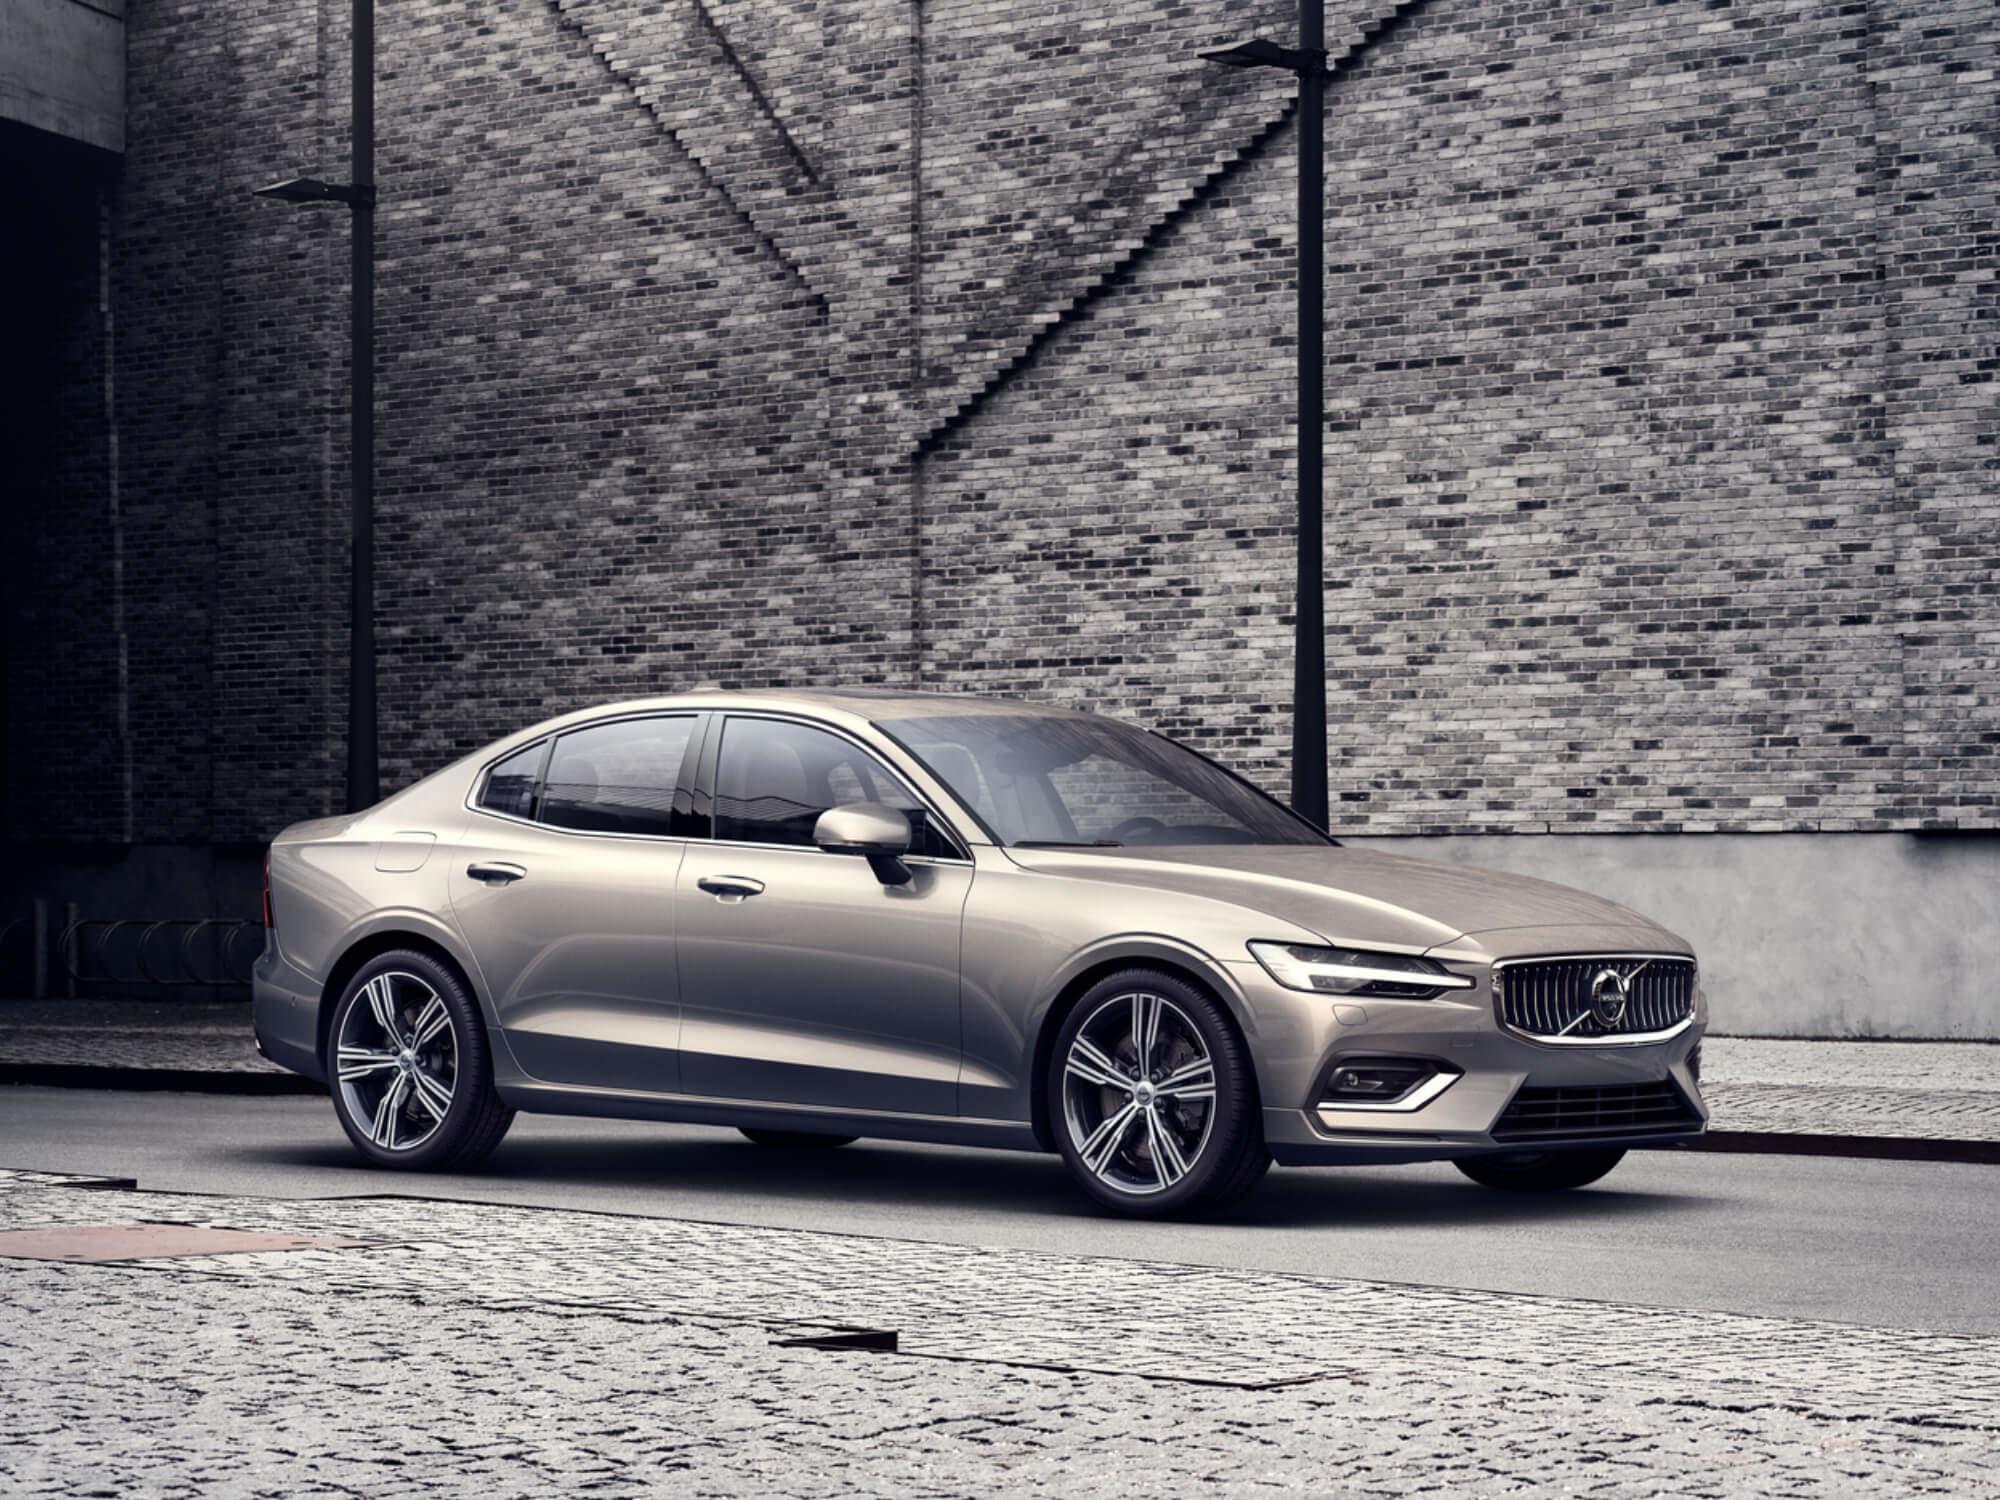 Volvo S60 Mild Hybrid bij muur